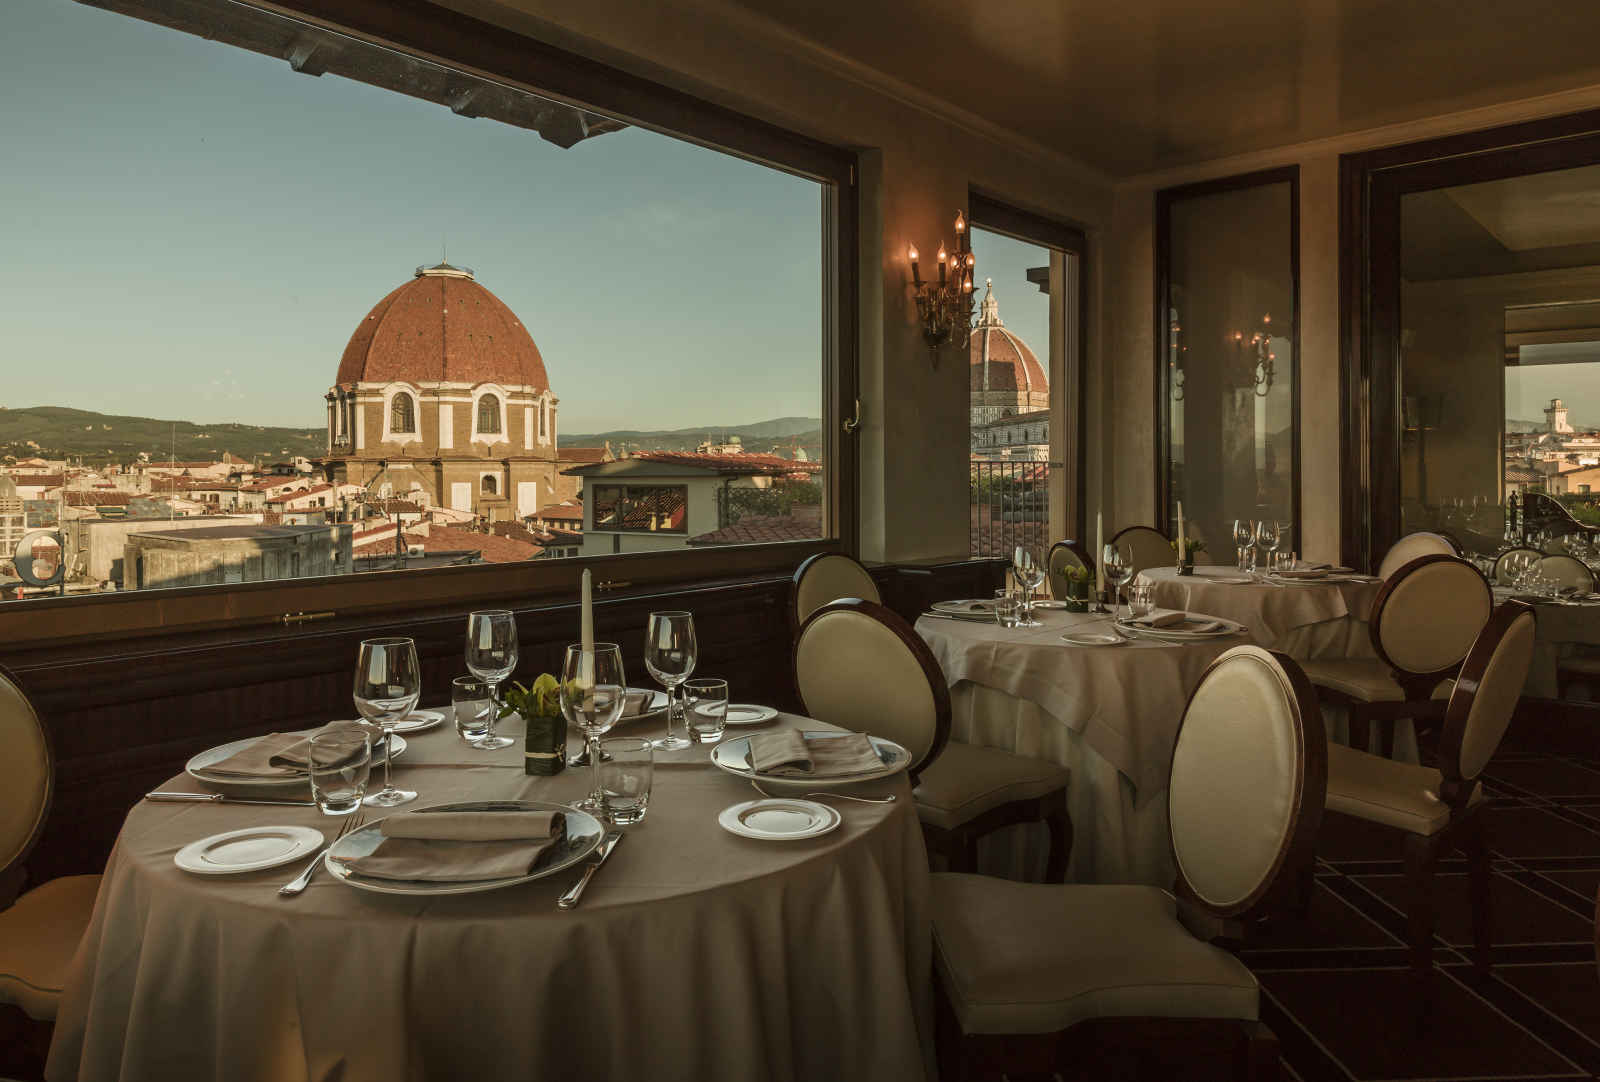 Séjour Toscane - Grand Hotel Baglioni - 4*